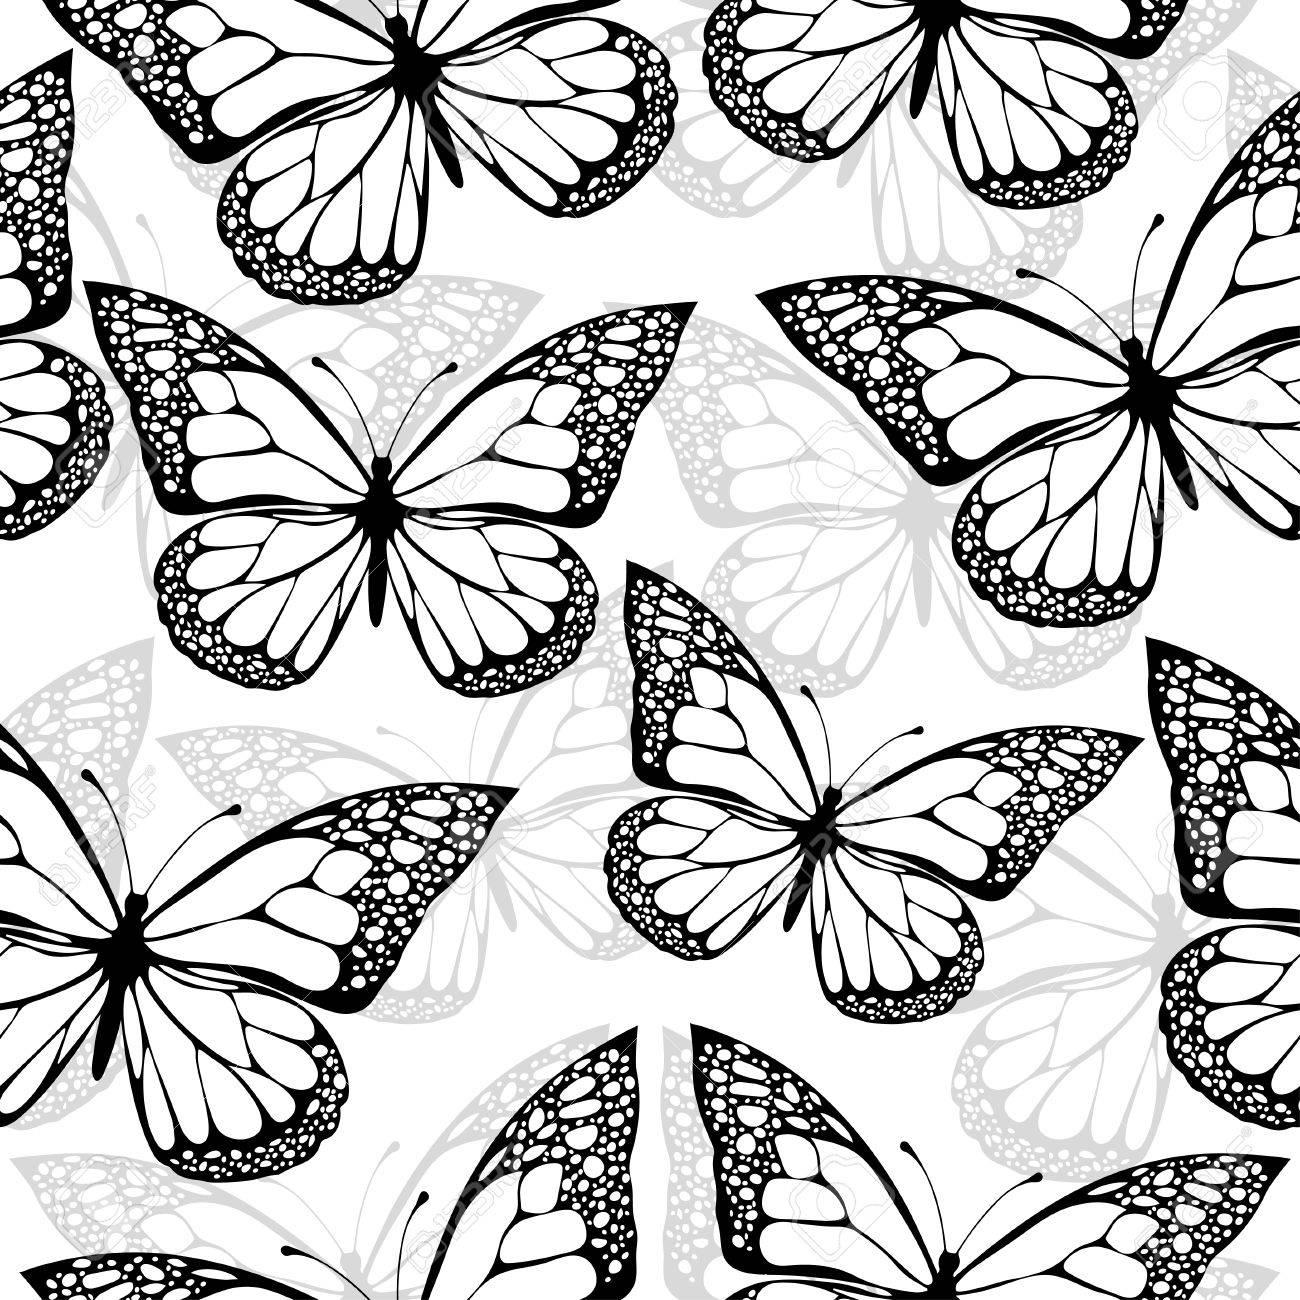 1300x1300 Butterflies Seamless Pattern, Monochrome, Coloring Book, Black